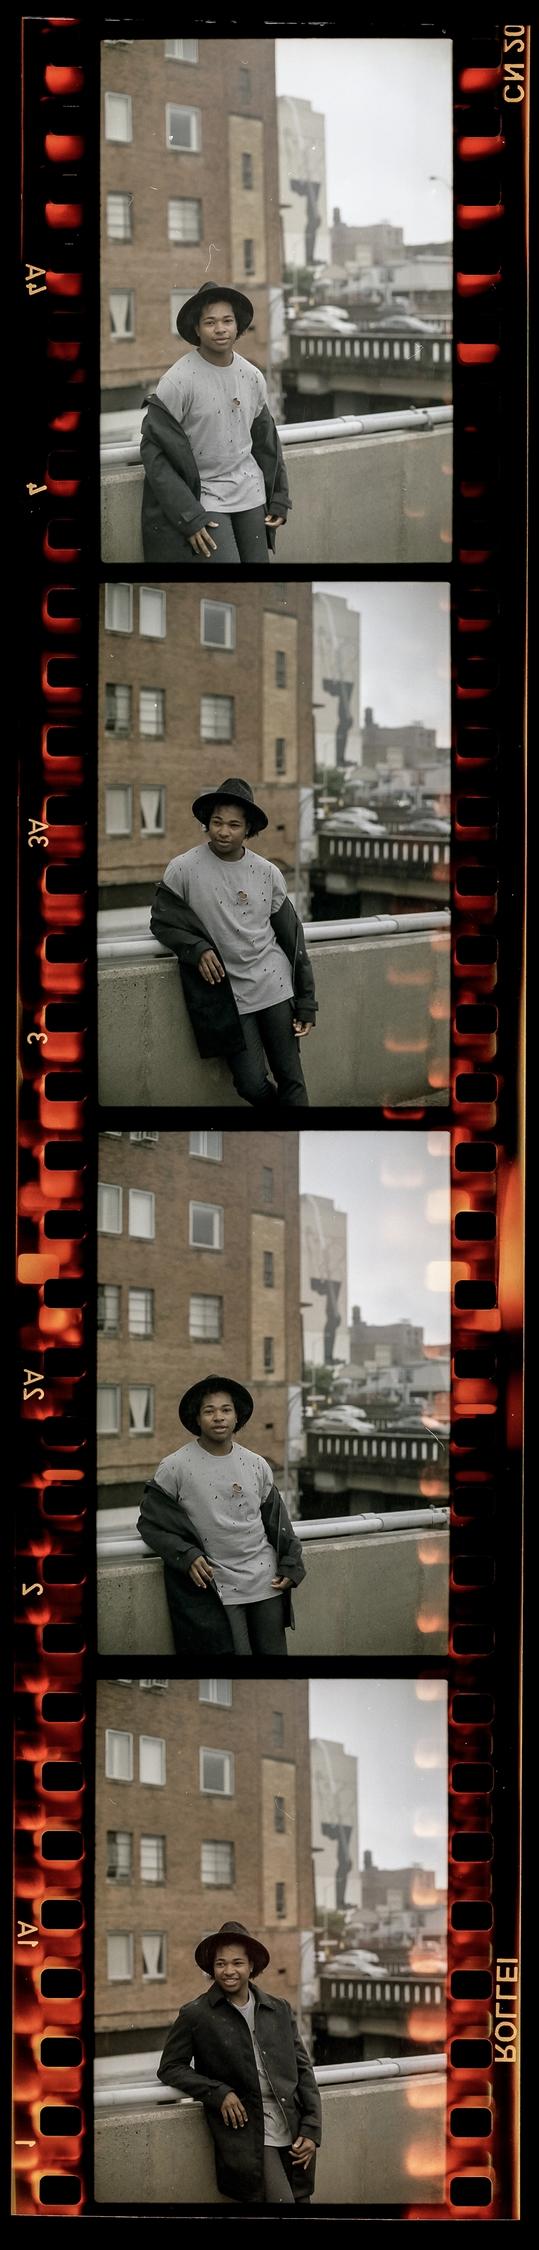 filmphotography, fashionphotography - karenwink | ello